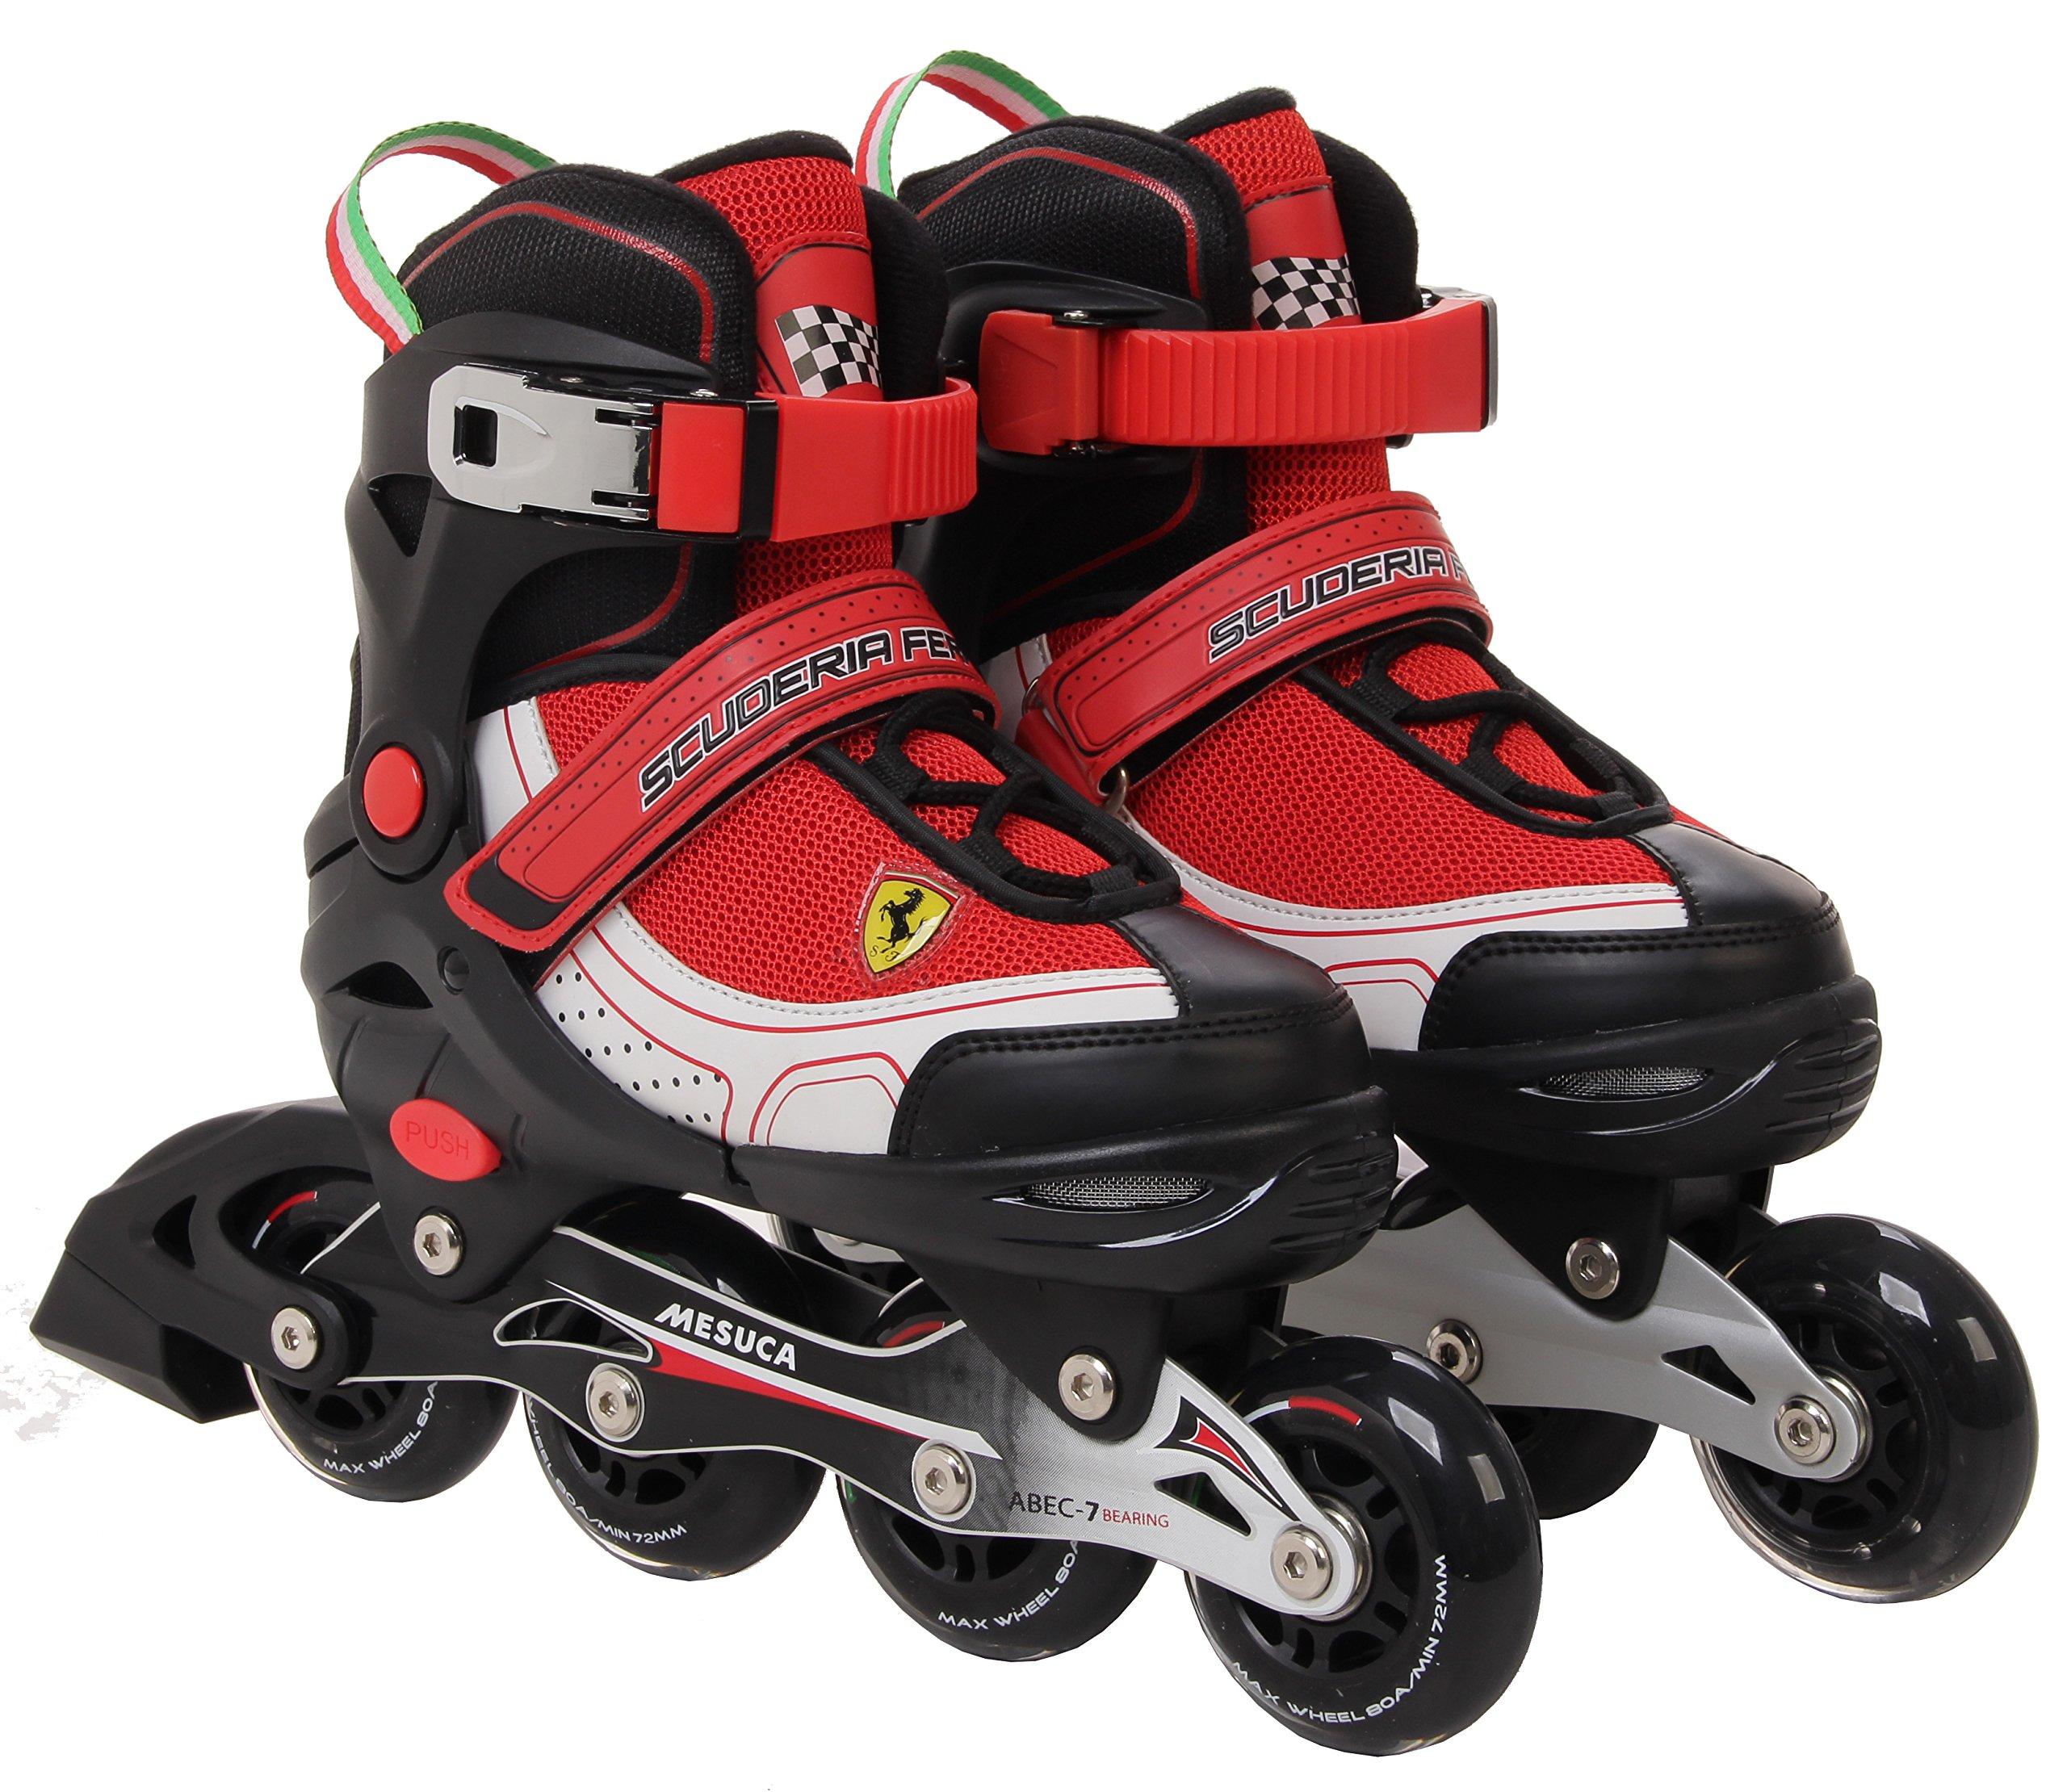 Ferrari Inline Skate, Black/Red, Size 34-37